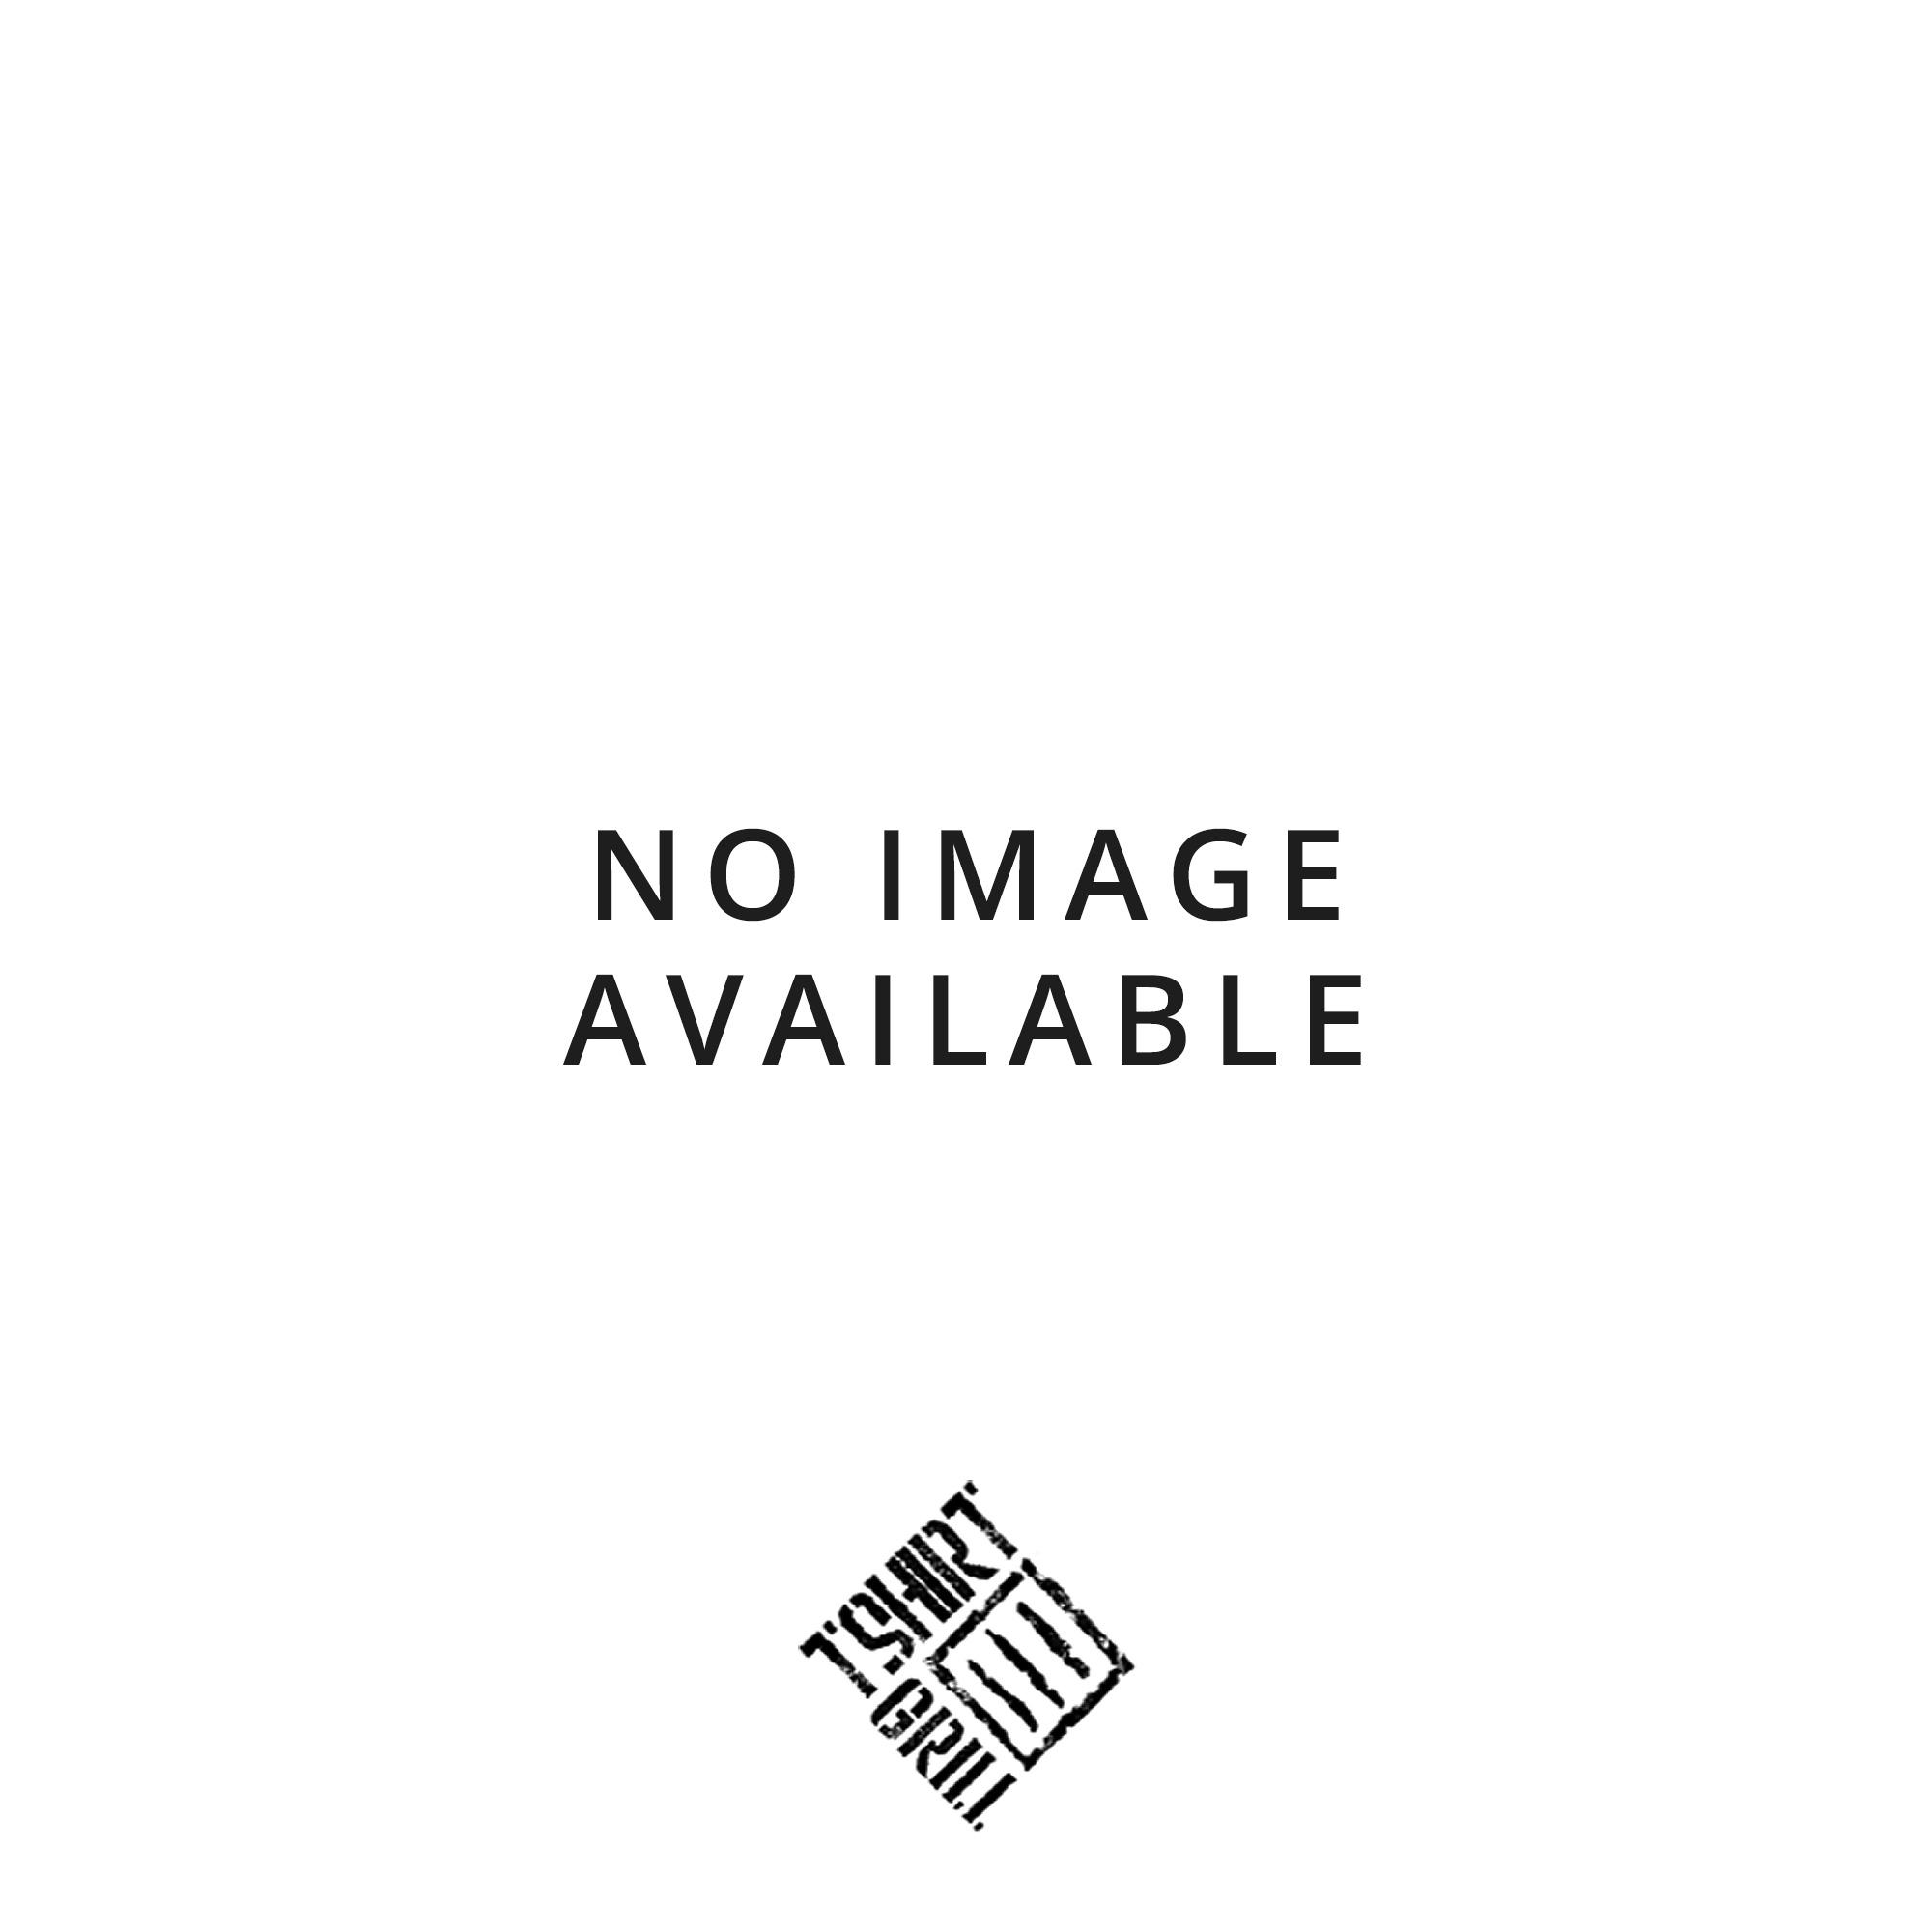 70's Chopper Bike T-shirt